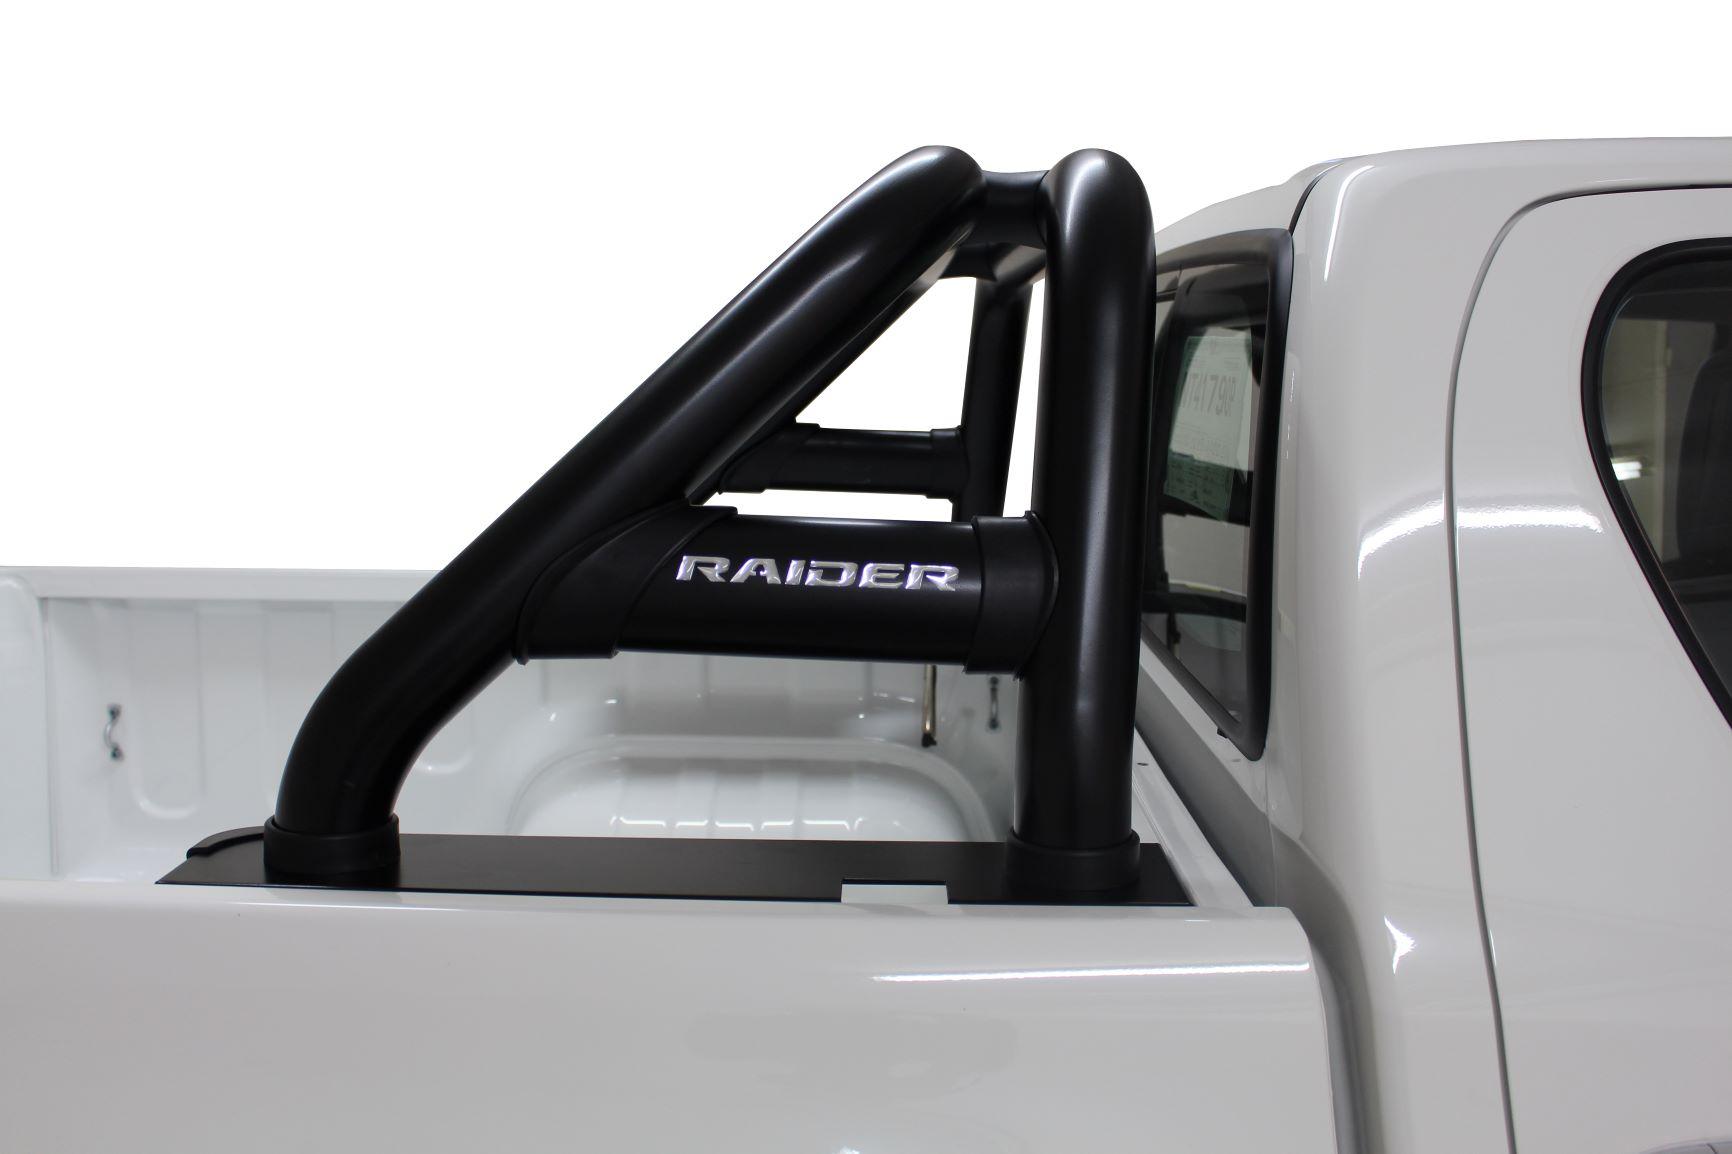 NEW HILUX FACELIFT RANGE (Fits GD6 Revo & New Facelift) Sports Bar Black Stainless